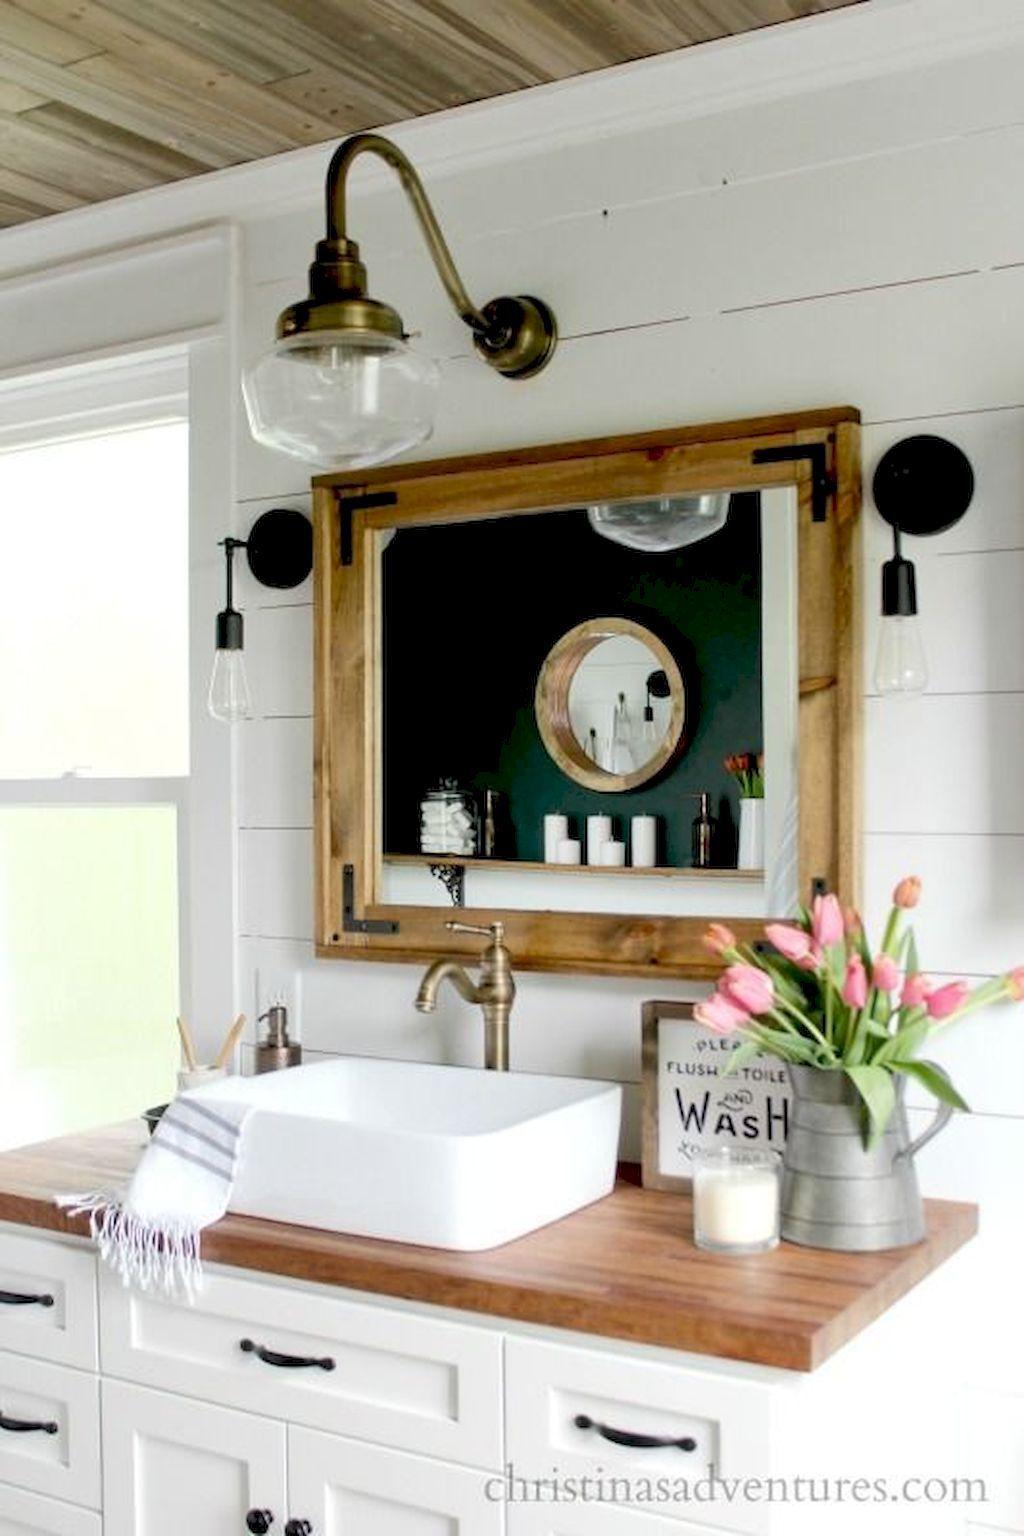 Cool 125 Brilliant Farmhouse Bathroom Vanity Remodel Ideas Https Livingmarch Com 125 Bathroom Vanity Remodel White Vanity Bathroom Farmhouse Bathroom Vanity